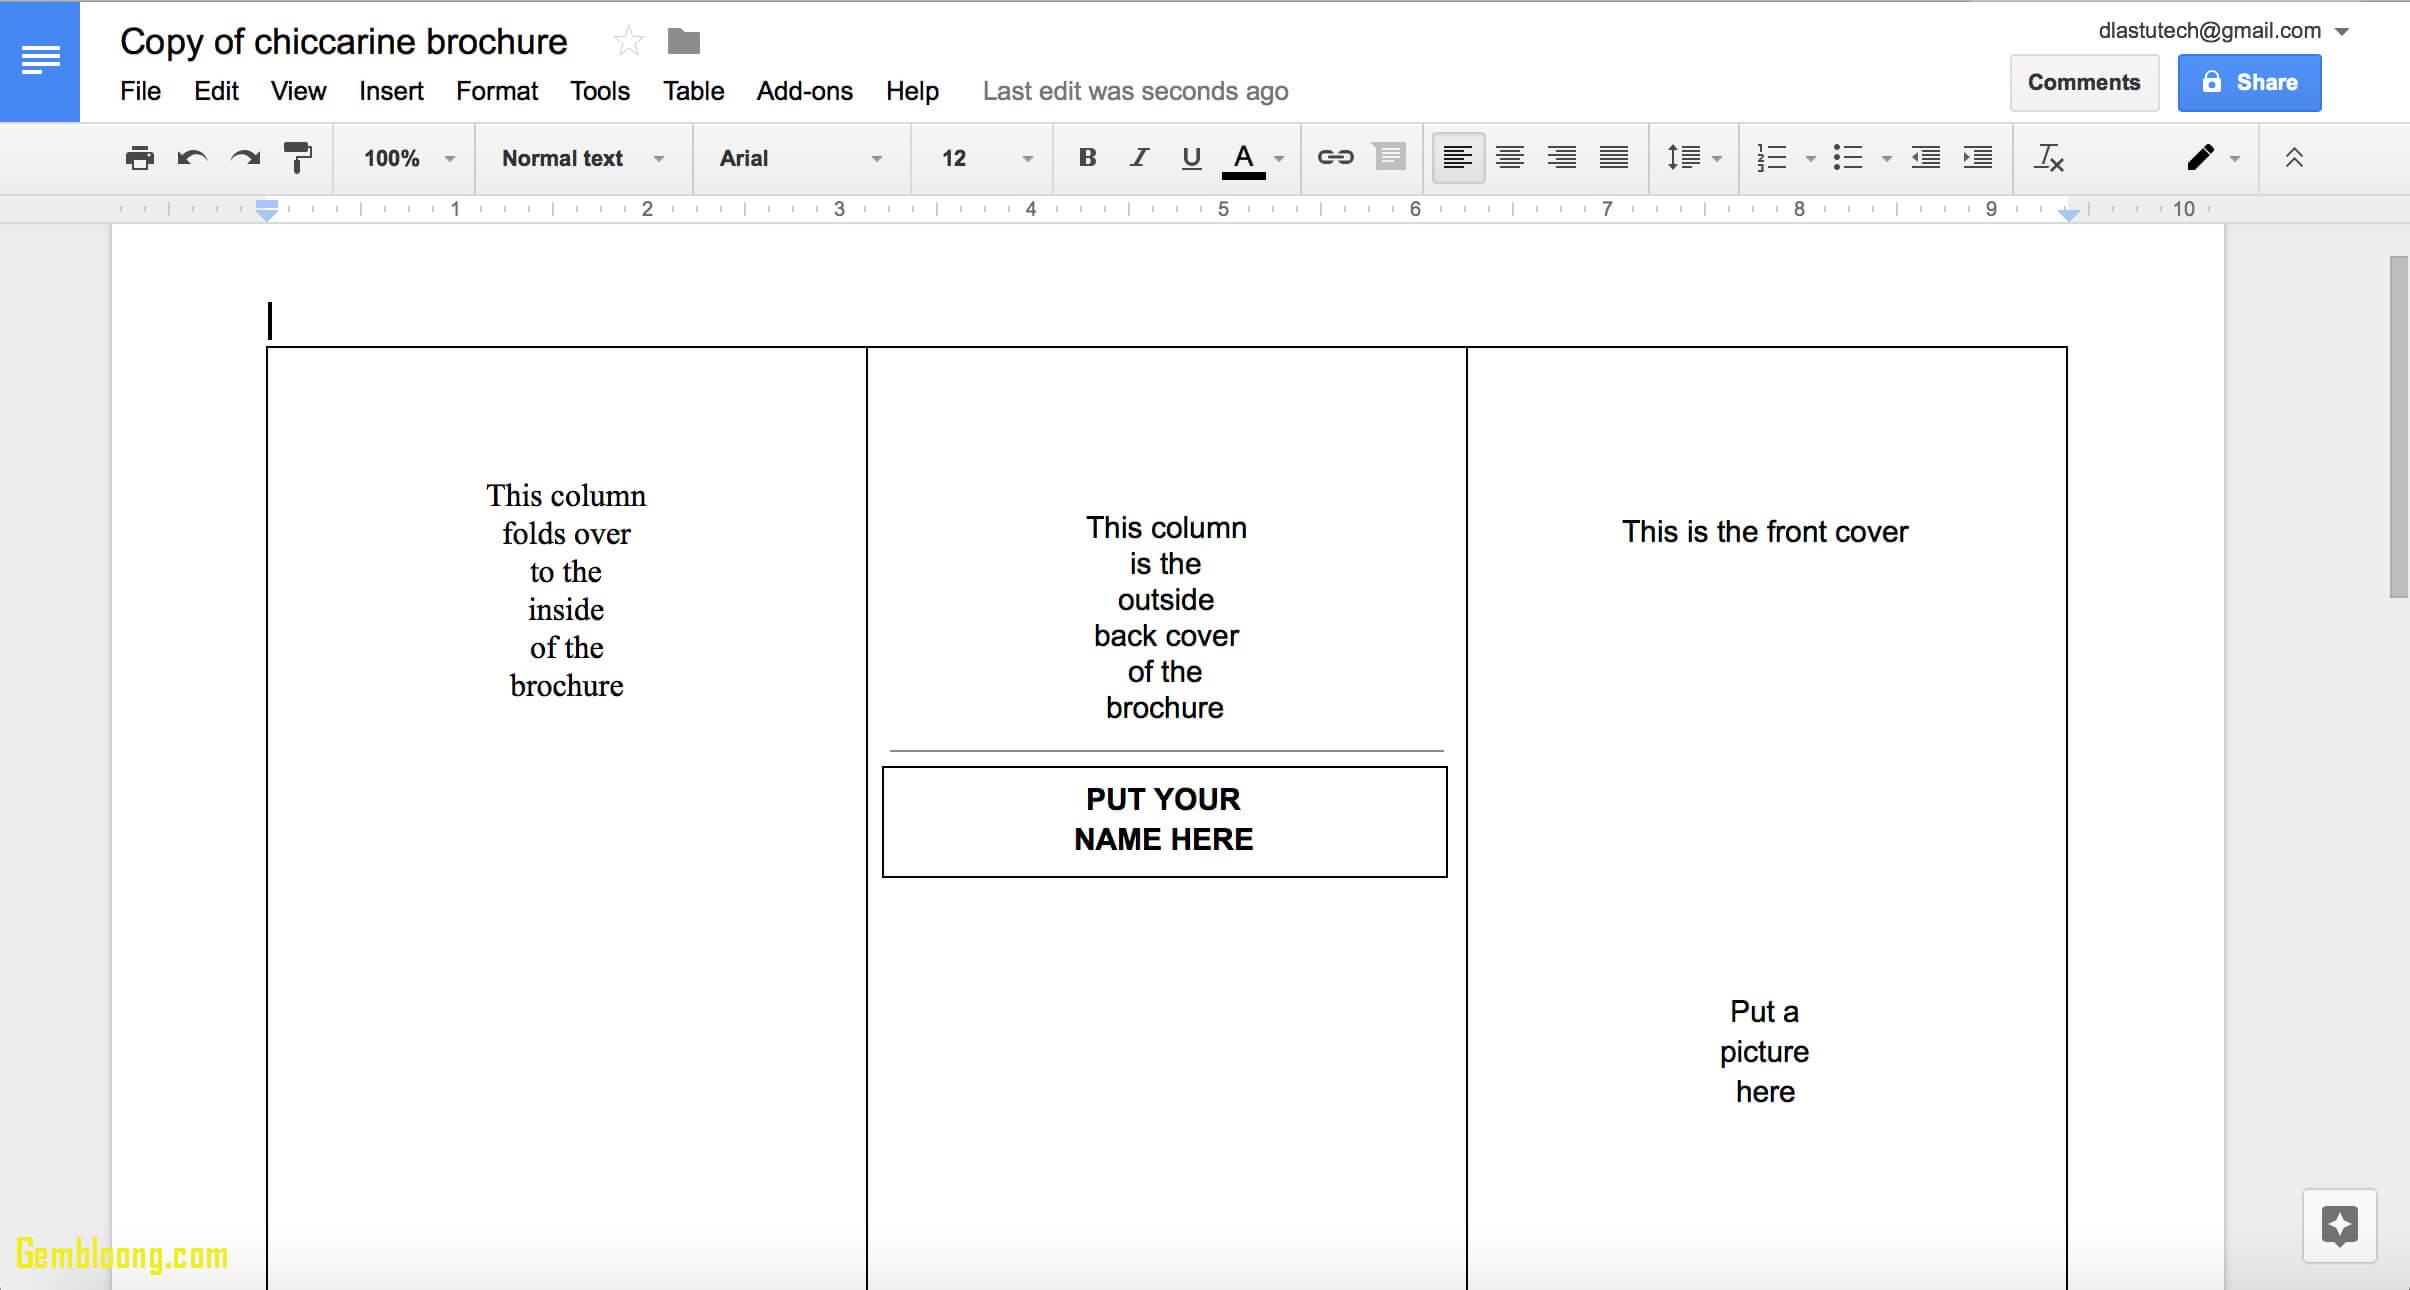 Google Drive Brochure Template - Cokhithuanpham Pertaining To Google Drive Brochure Templates